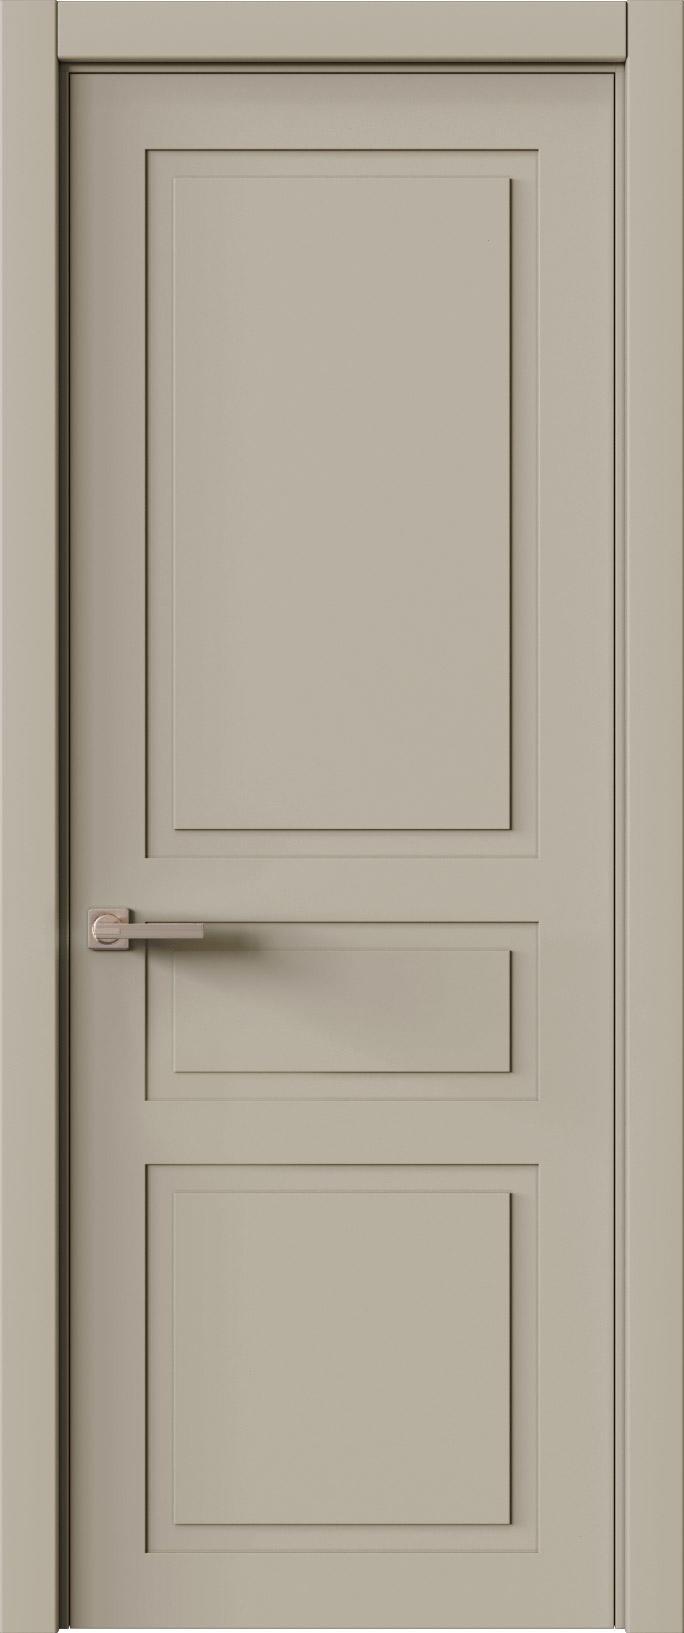 Tivoli Е-5 цвет - Серо-оливковая эмаль (RAL 7032) Без стекла (ДГ)